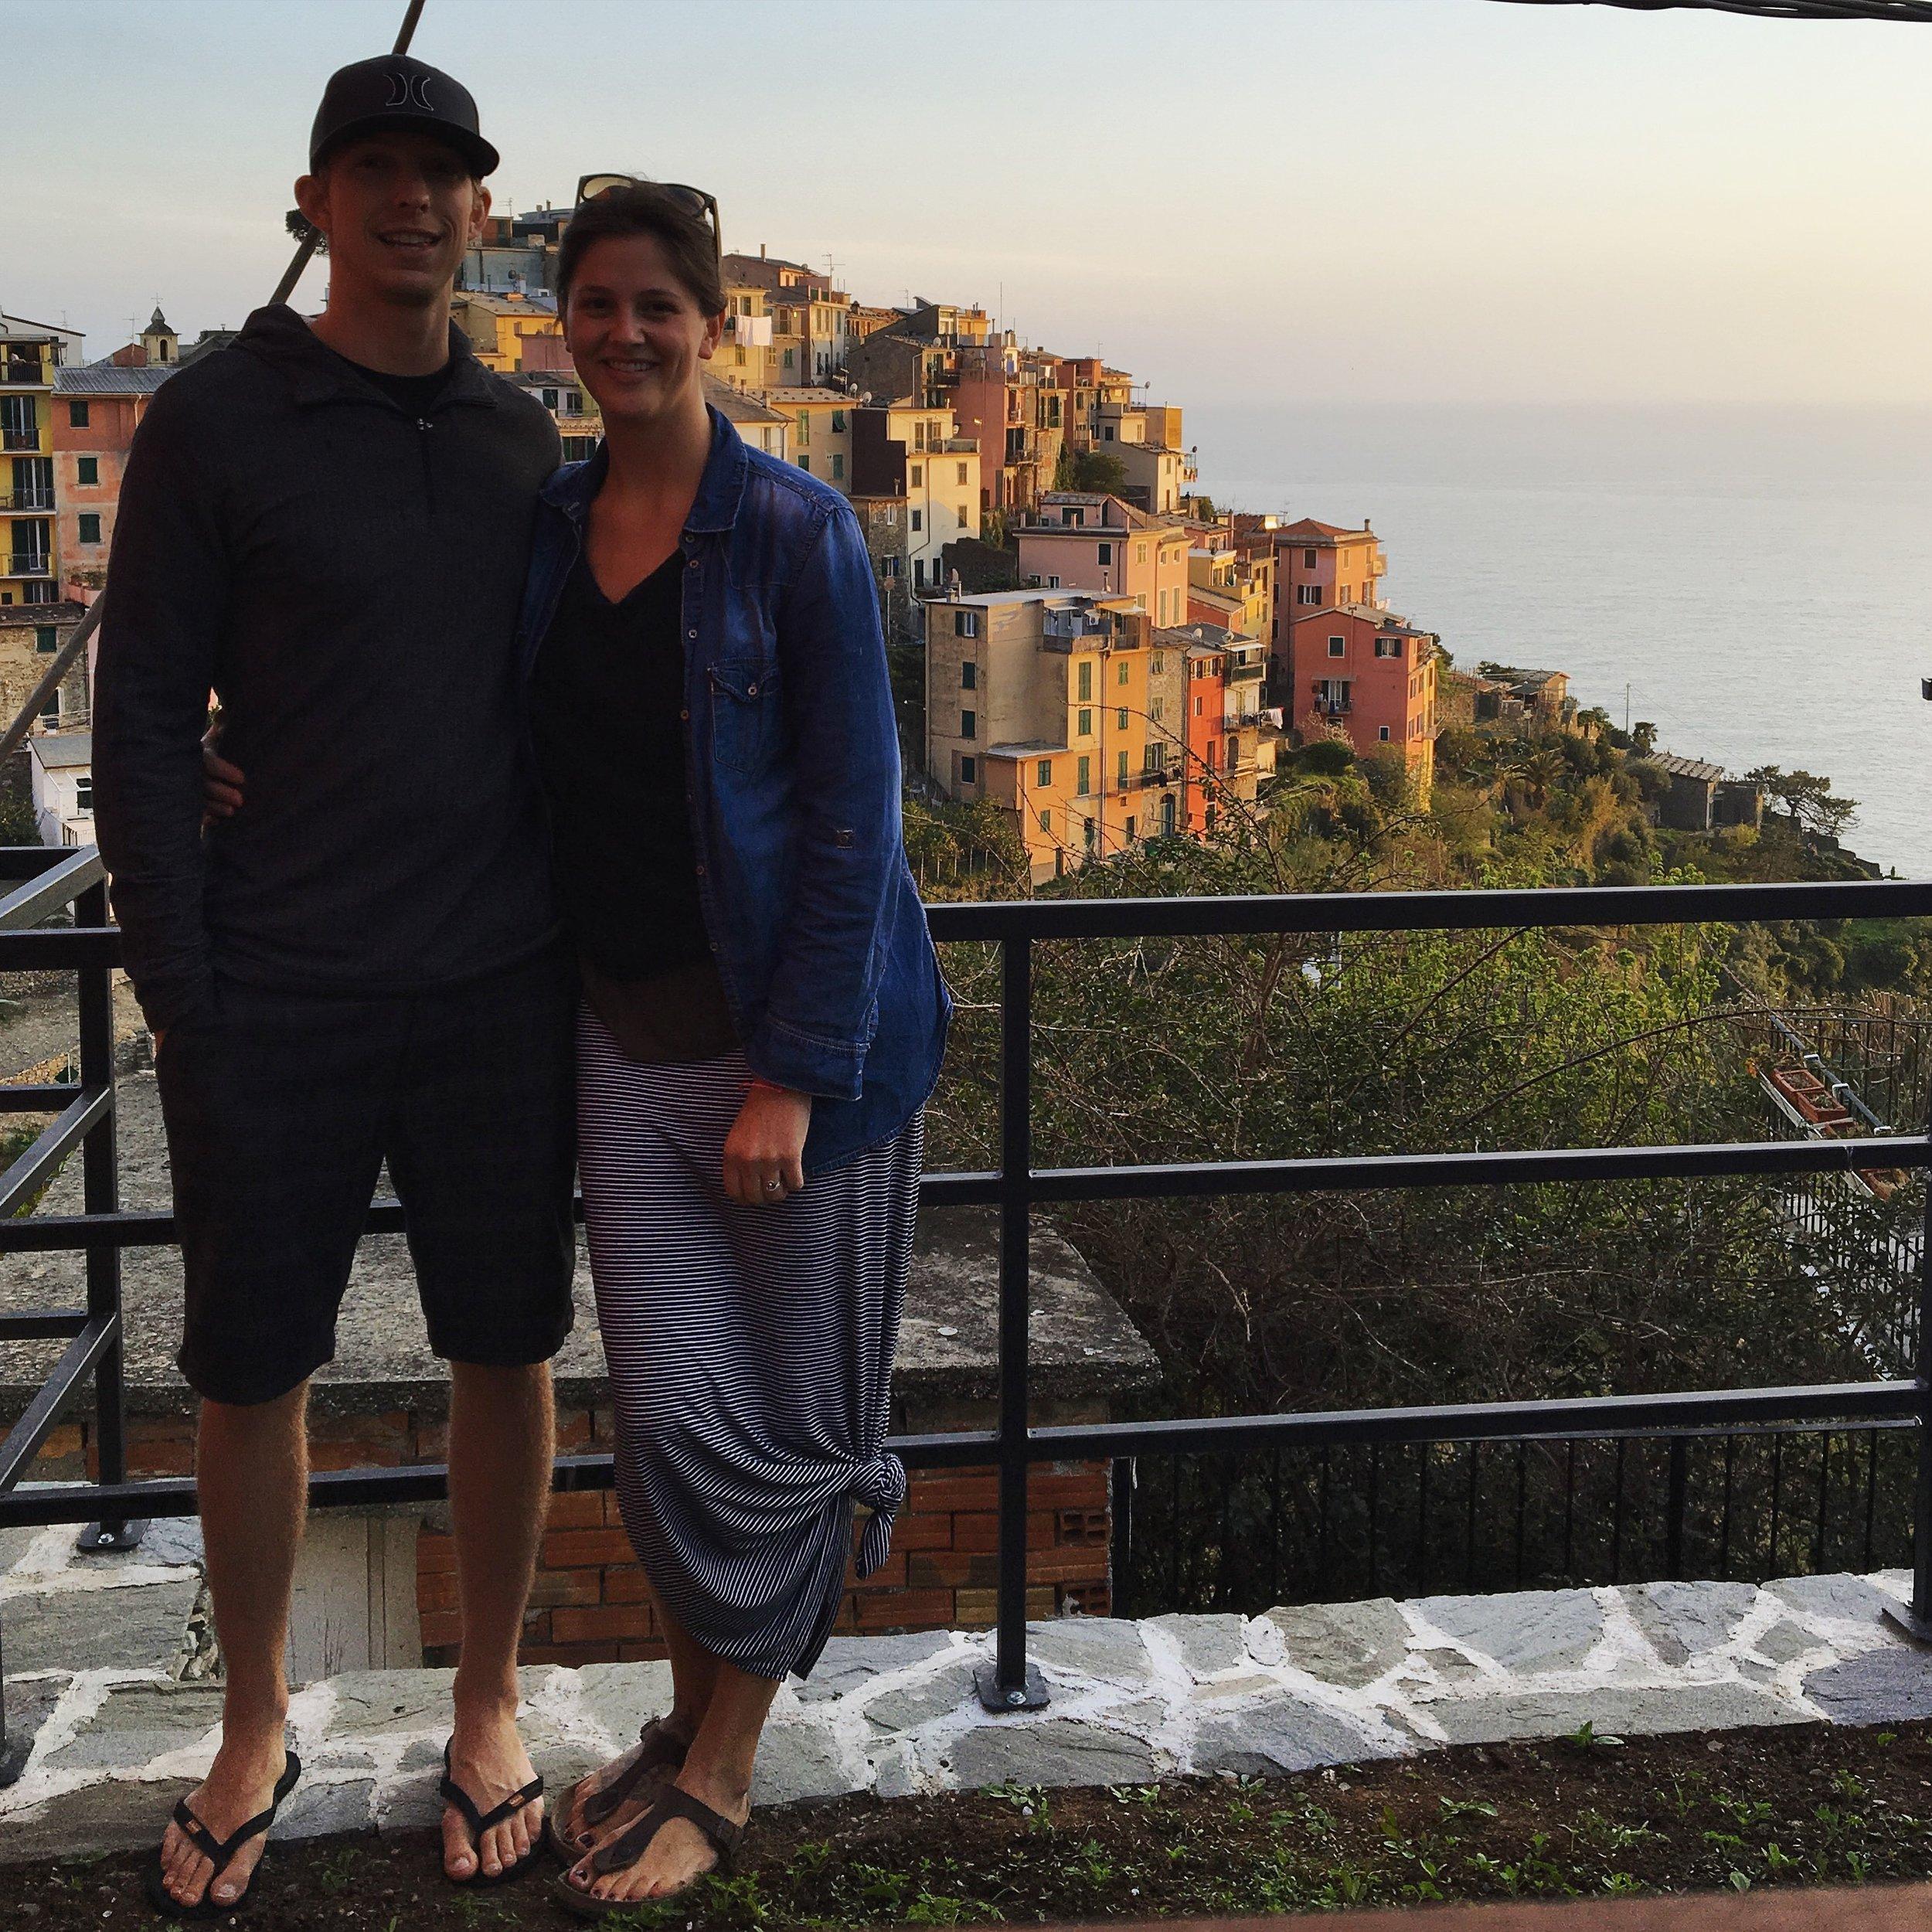 Honeymoon April 2016 -- Corniglia,Cinque Terre, Italy